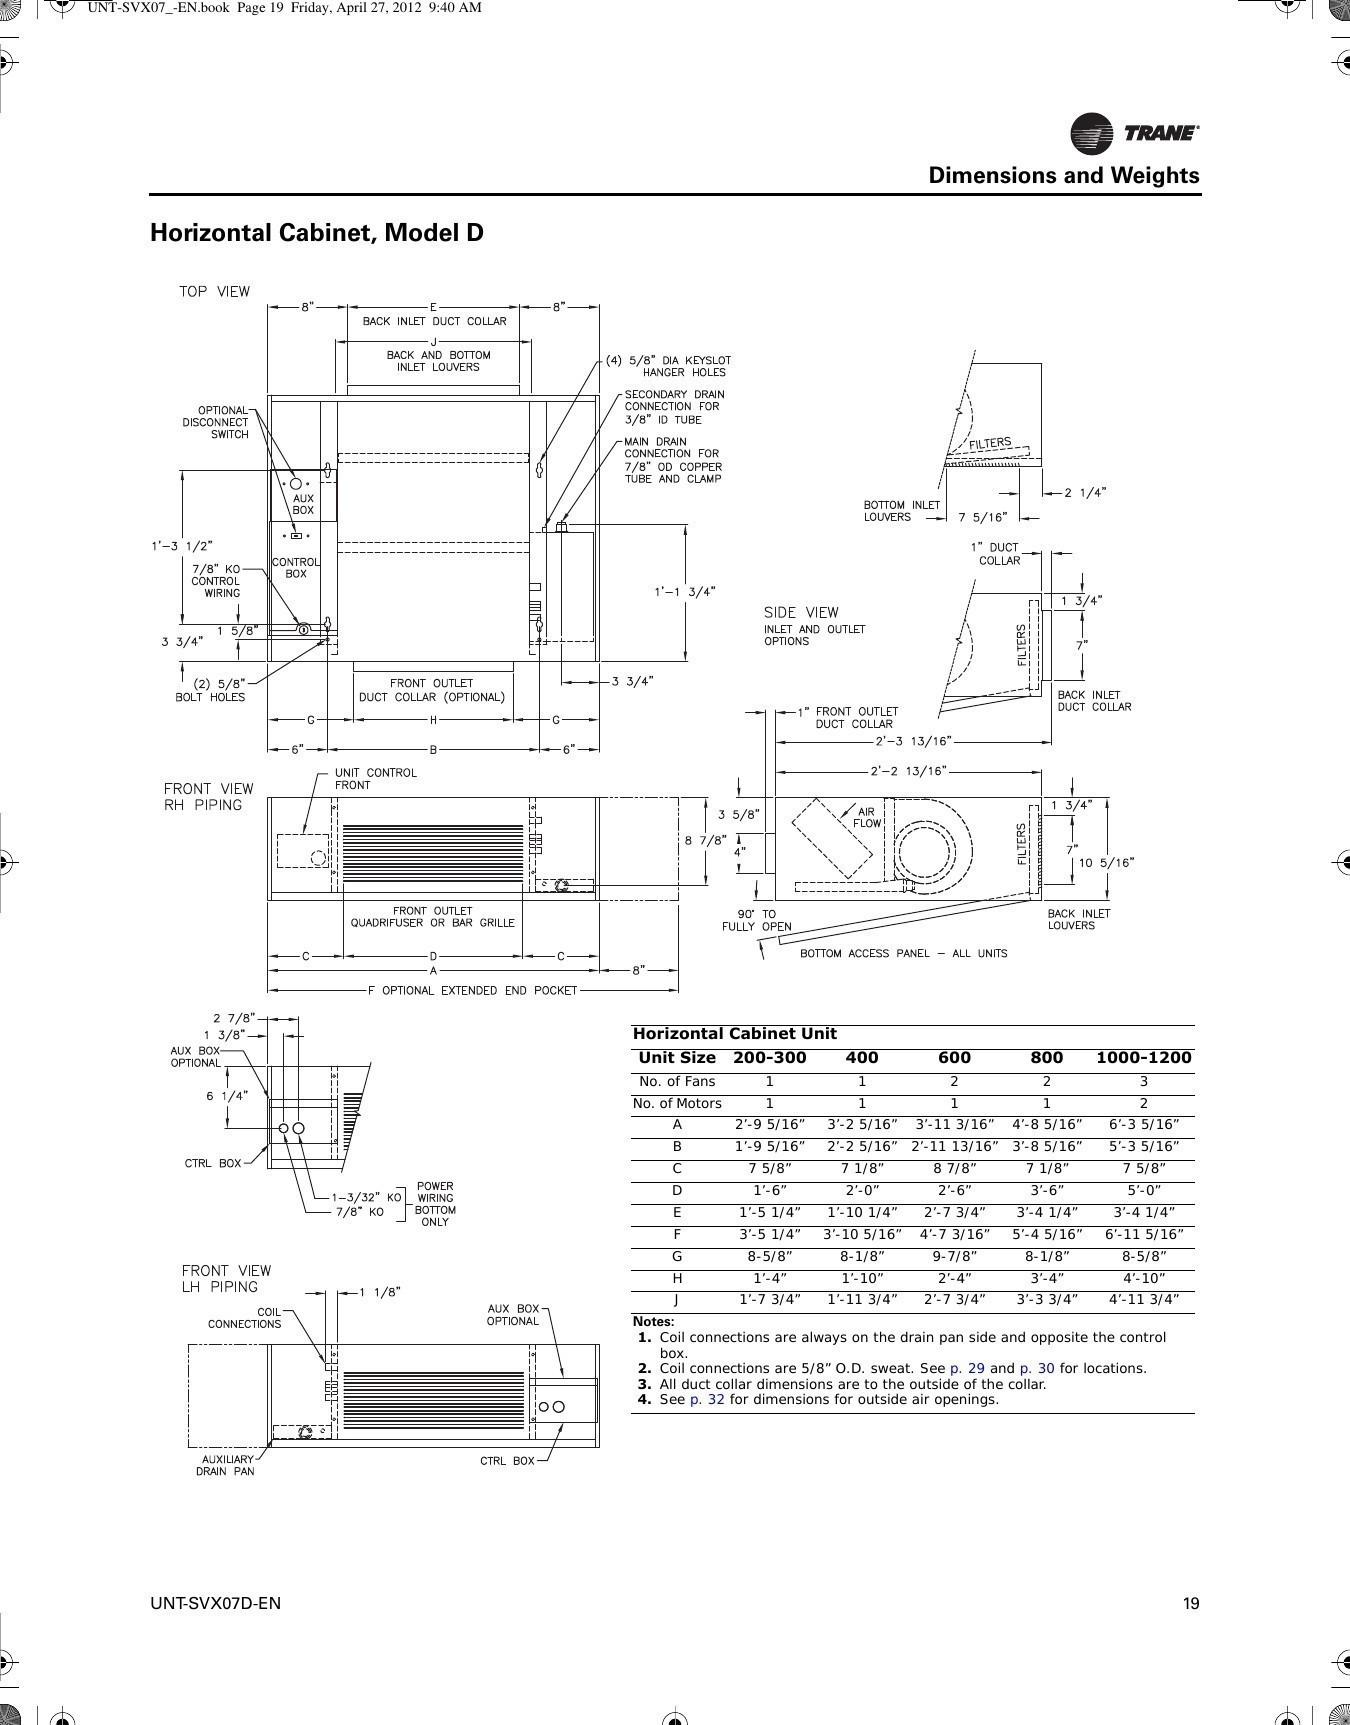 Weathertron thermostat Wiring Diagram Honeywell thermostat Wiring Diagram Rth2510 Refrence Honeywell Of Weathertron thermostat Wiring Diagram